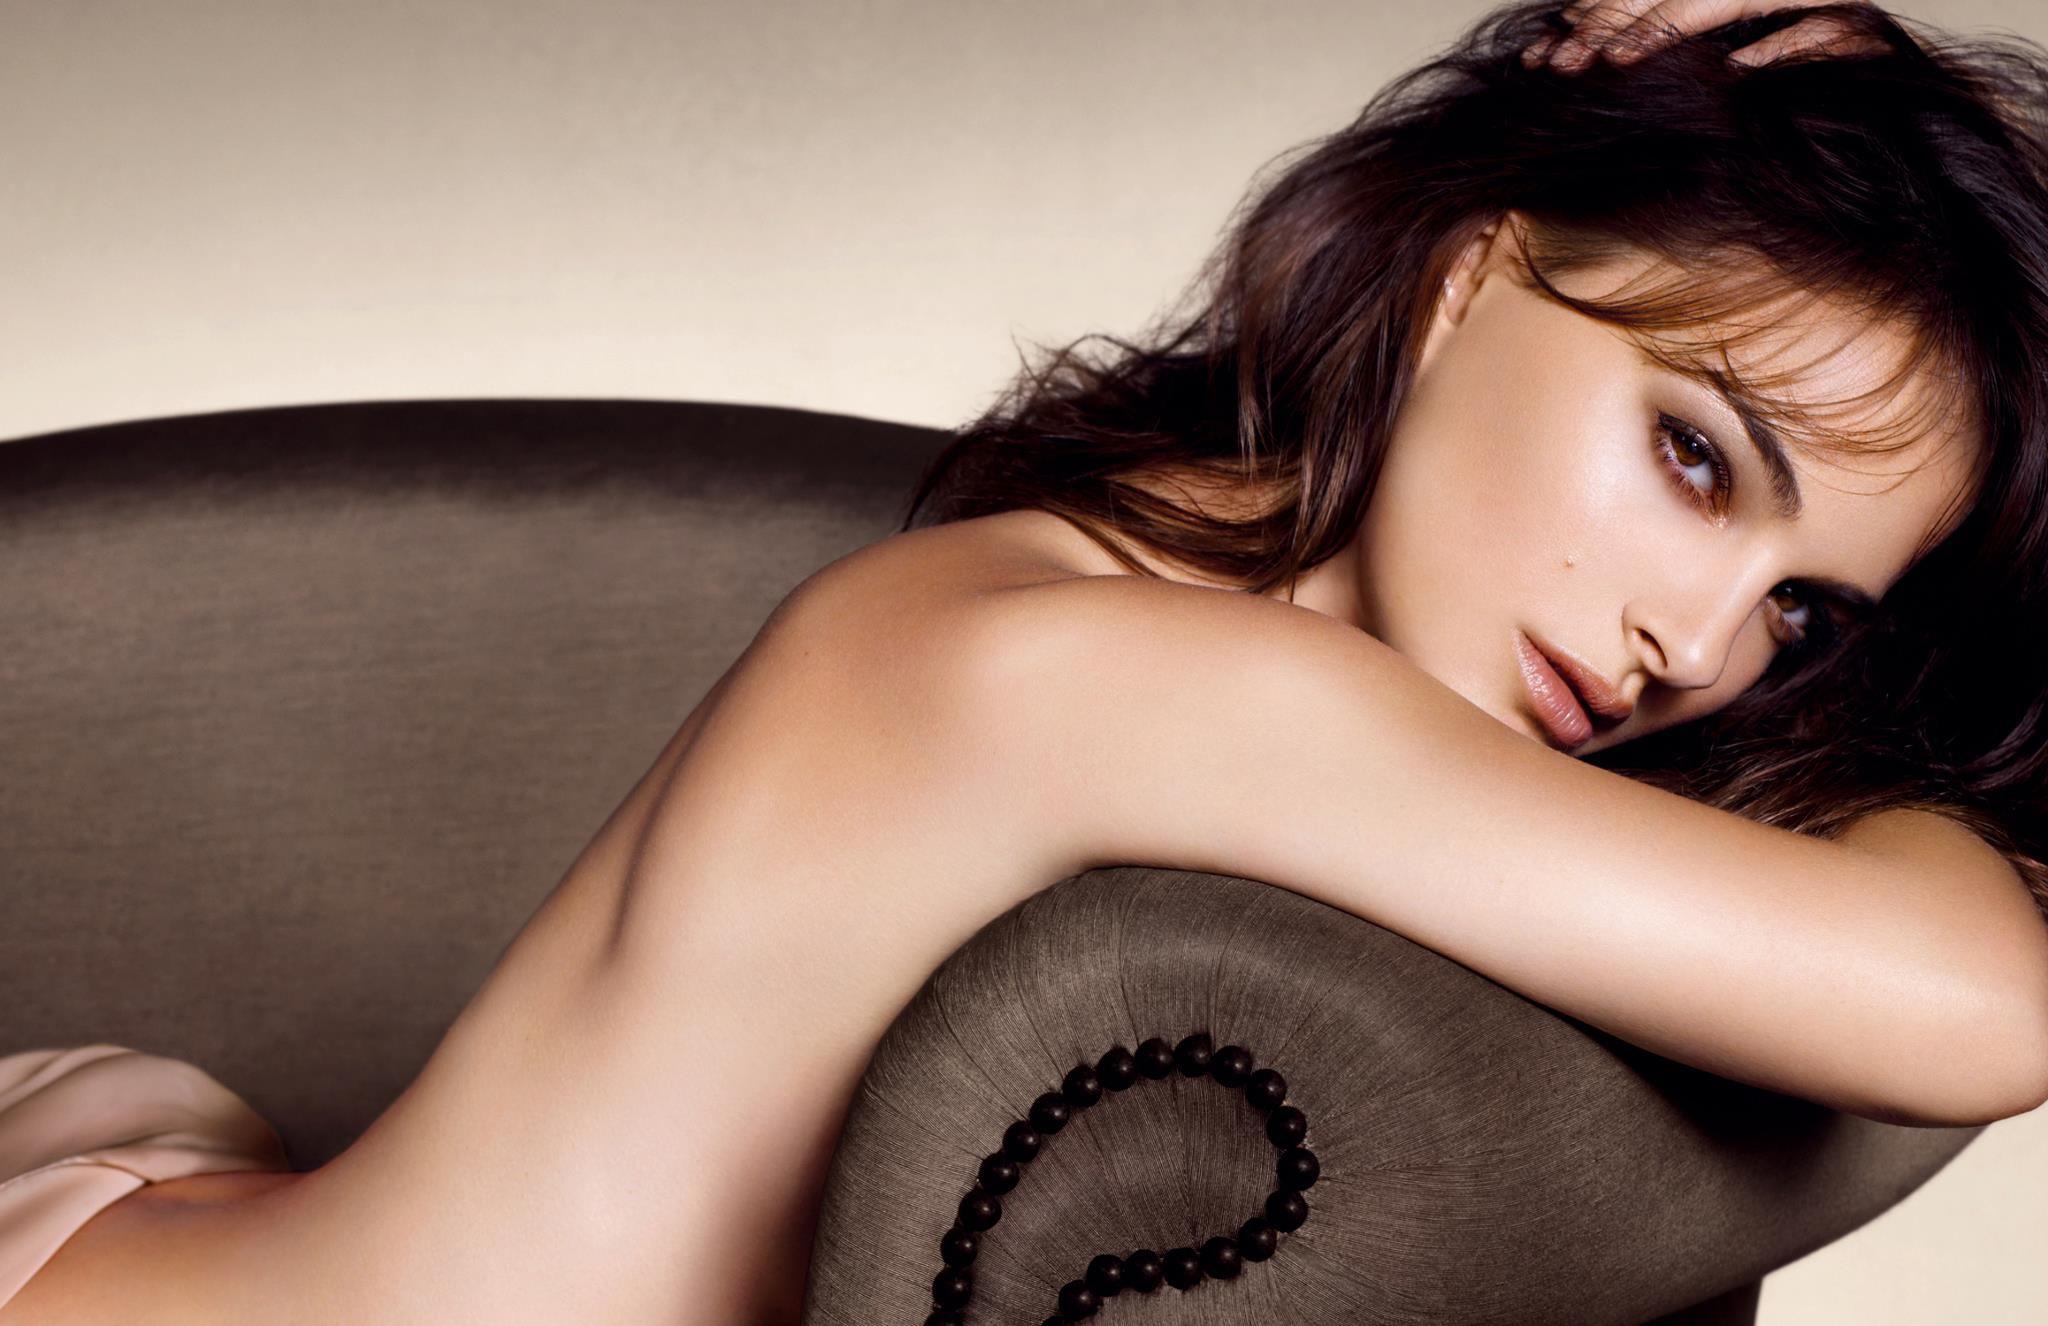 Skinny naked asian girls pussy